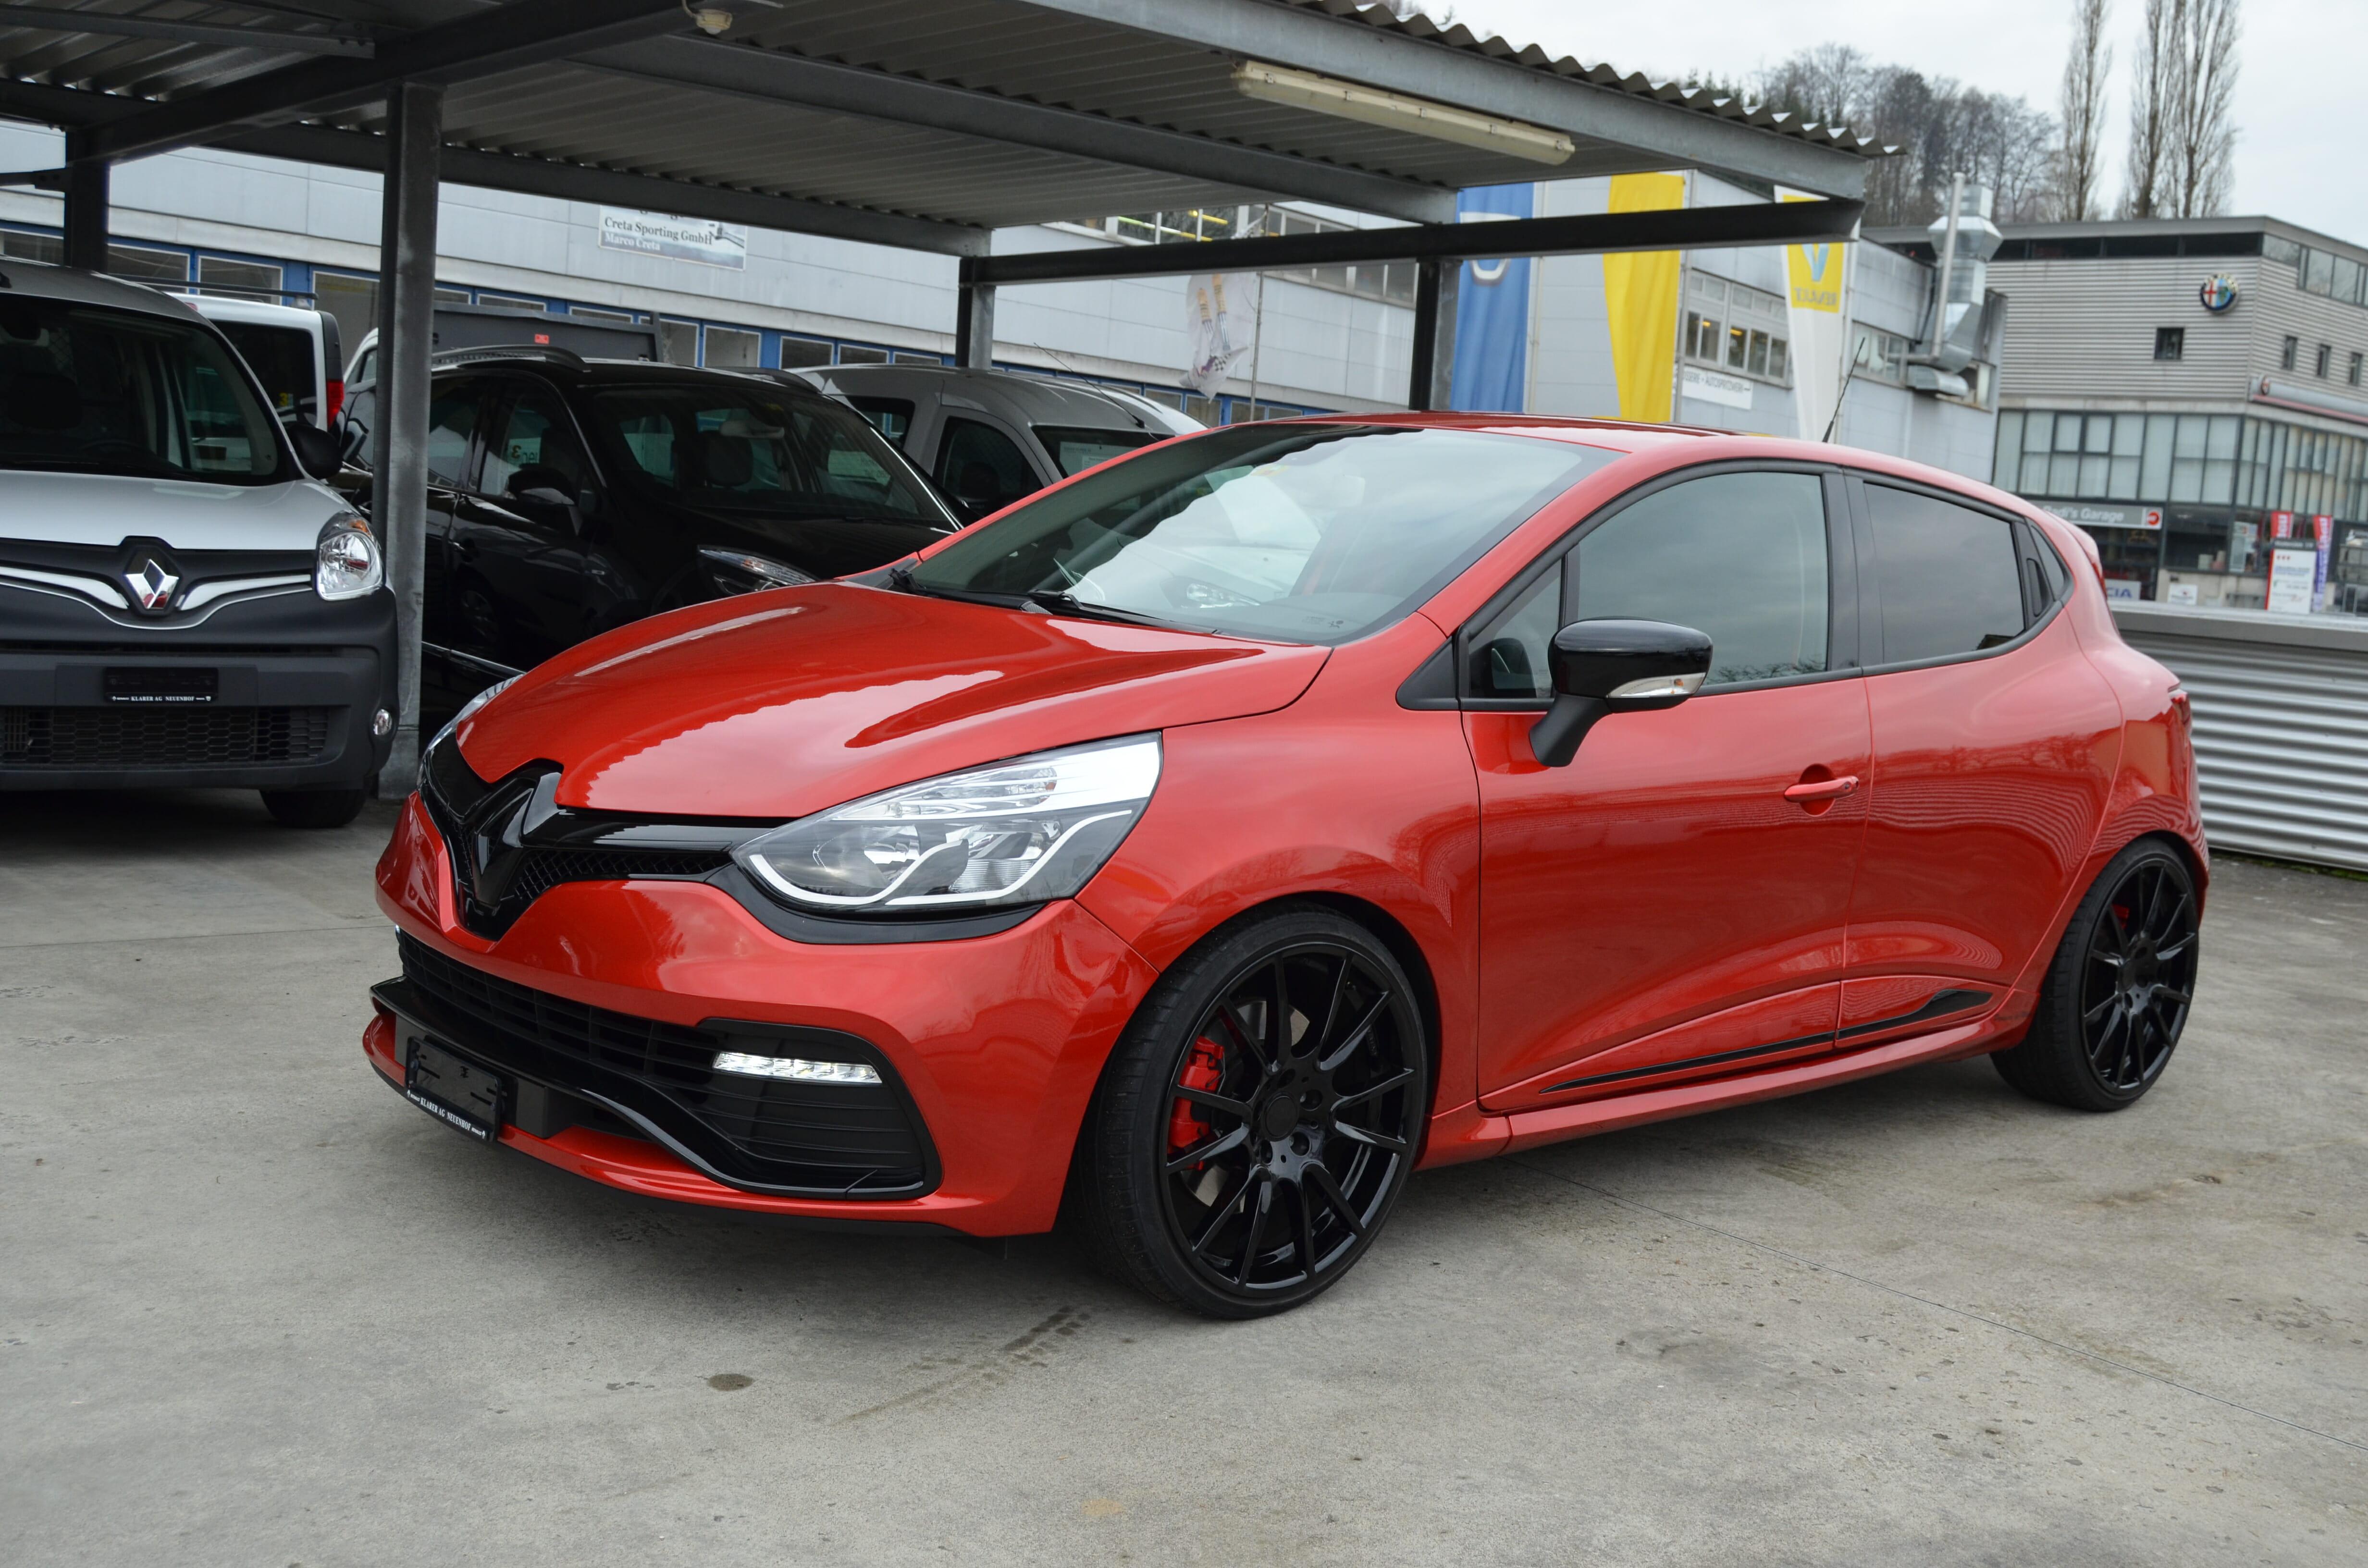 Renault clio rs 200 edc garage klarer for Garage clio 4